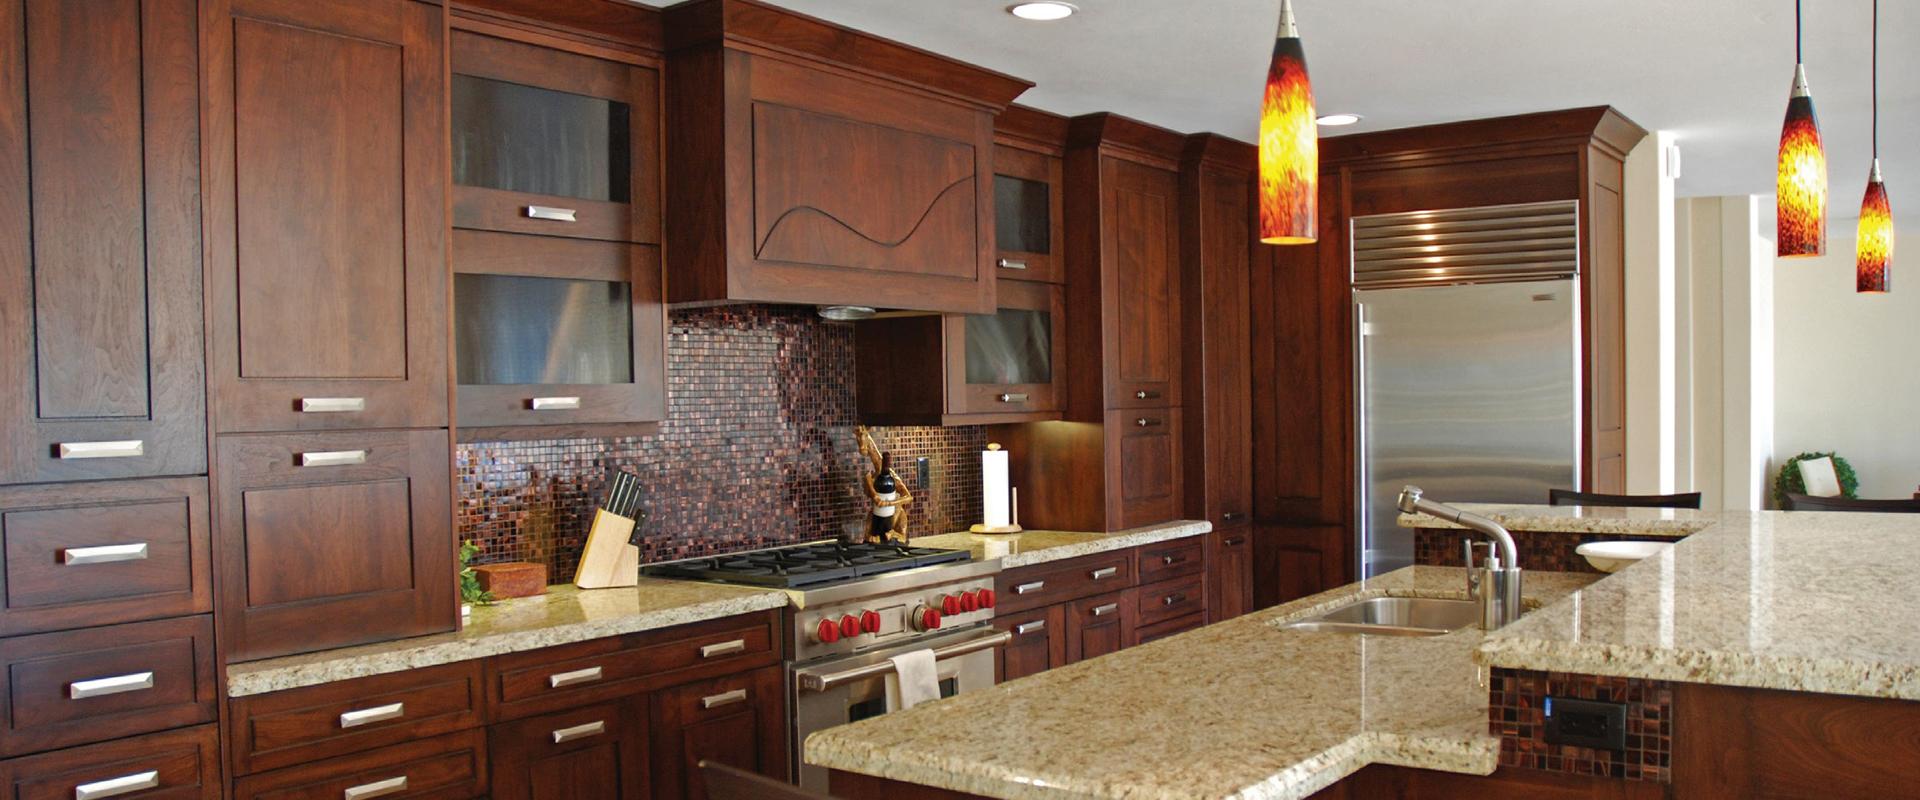 Catani Cabinets